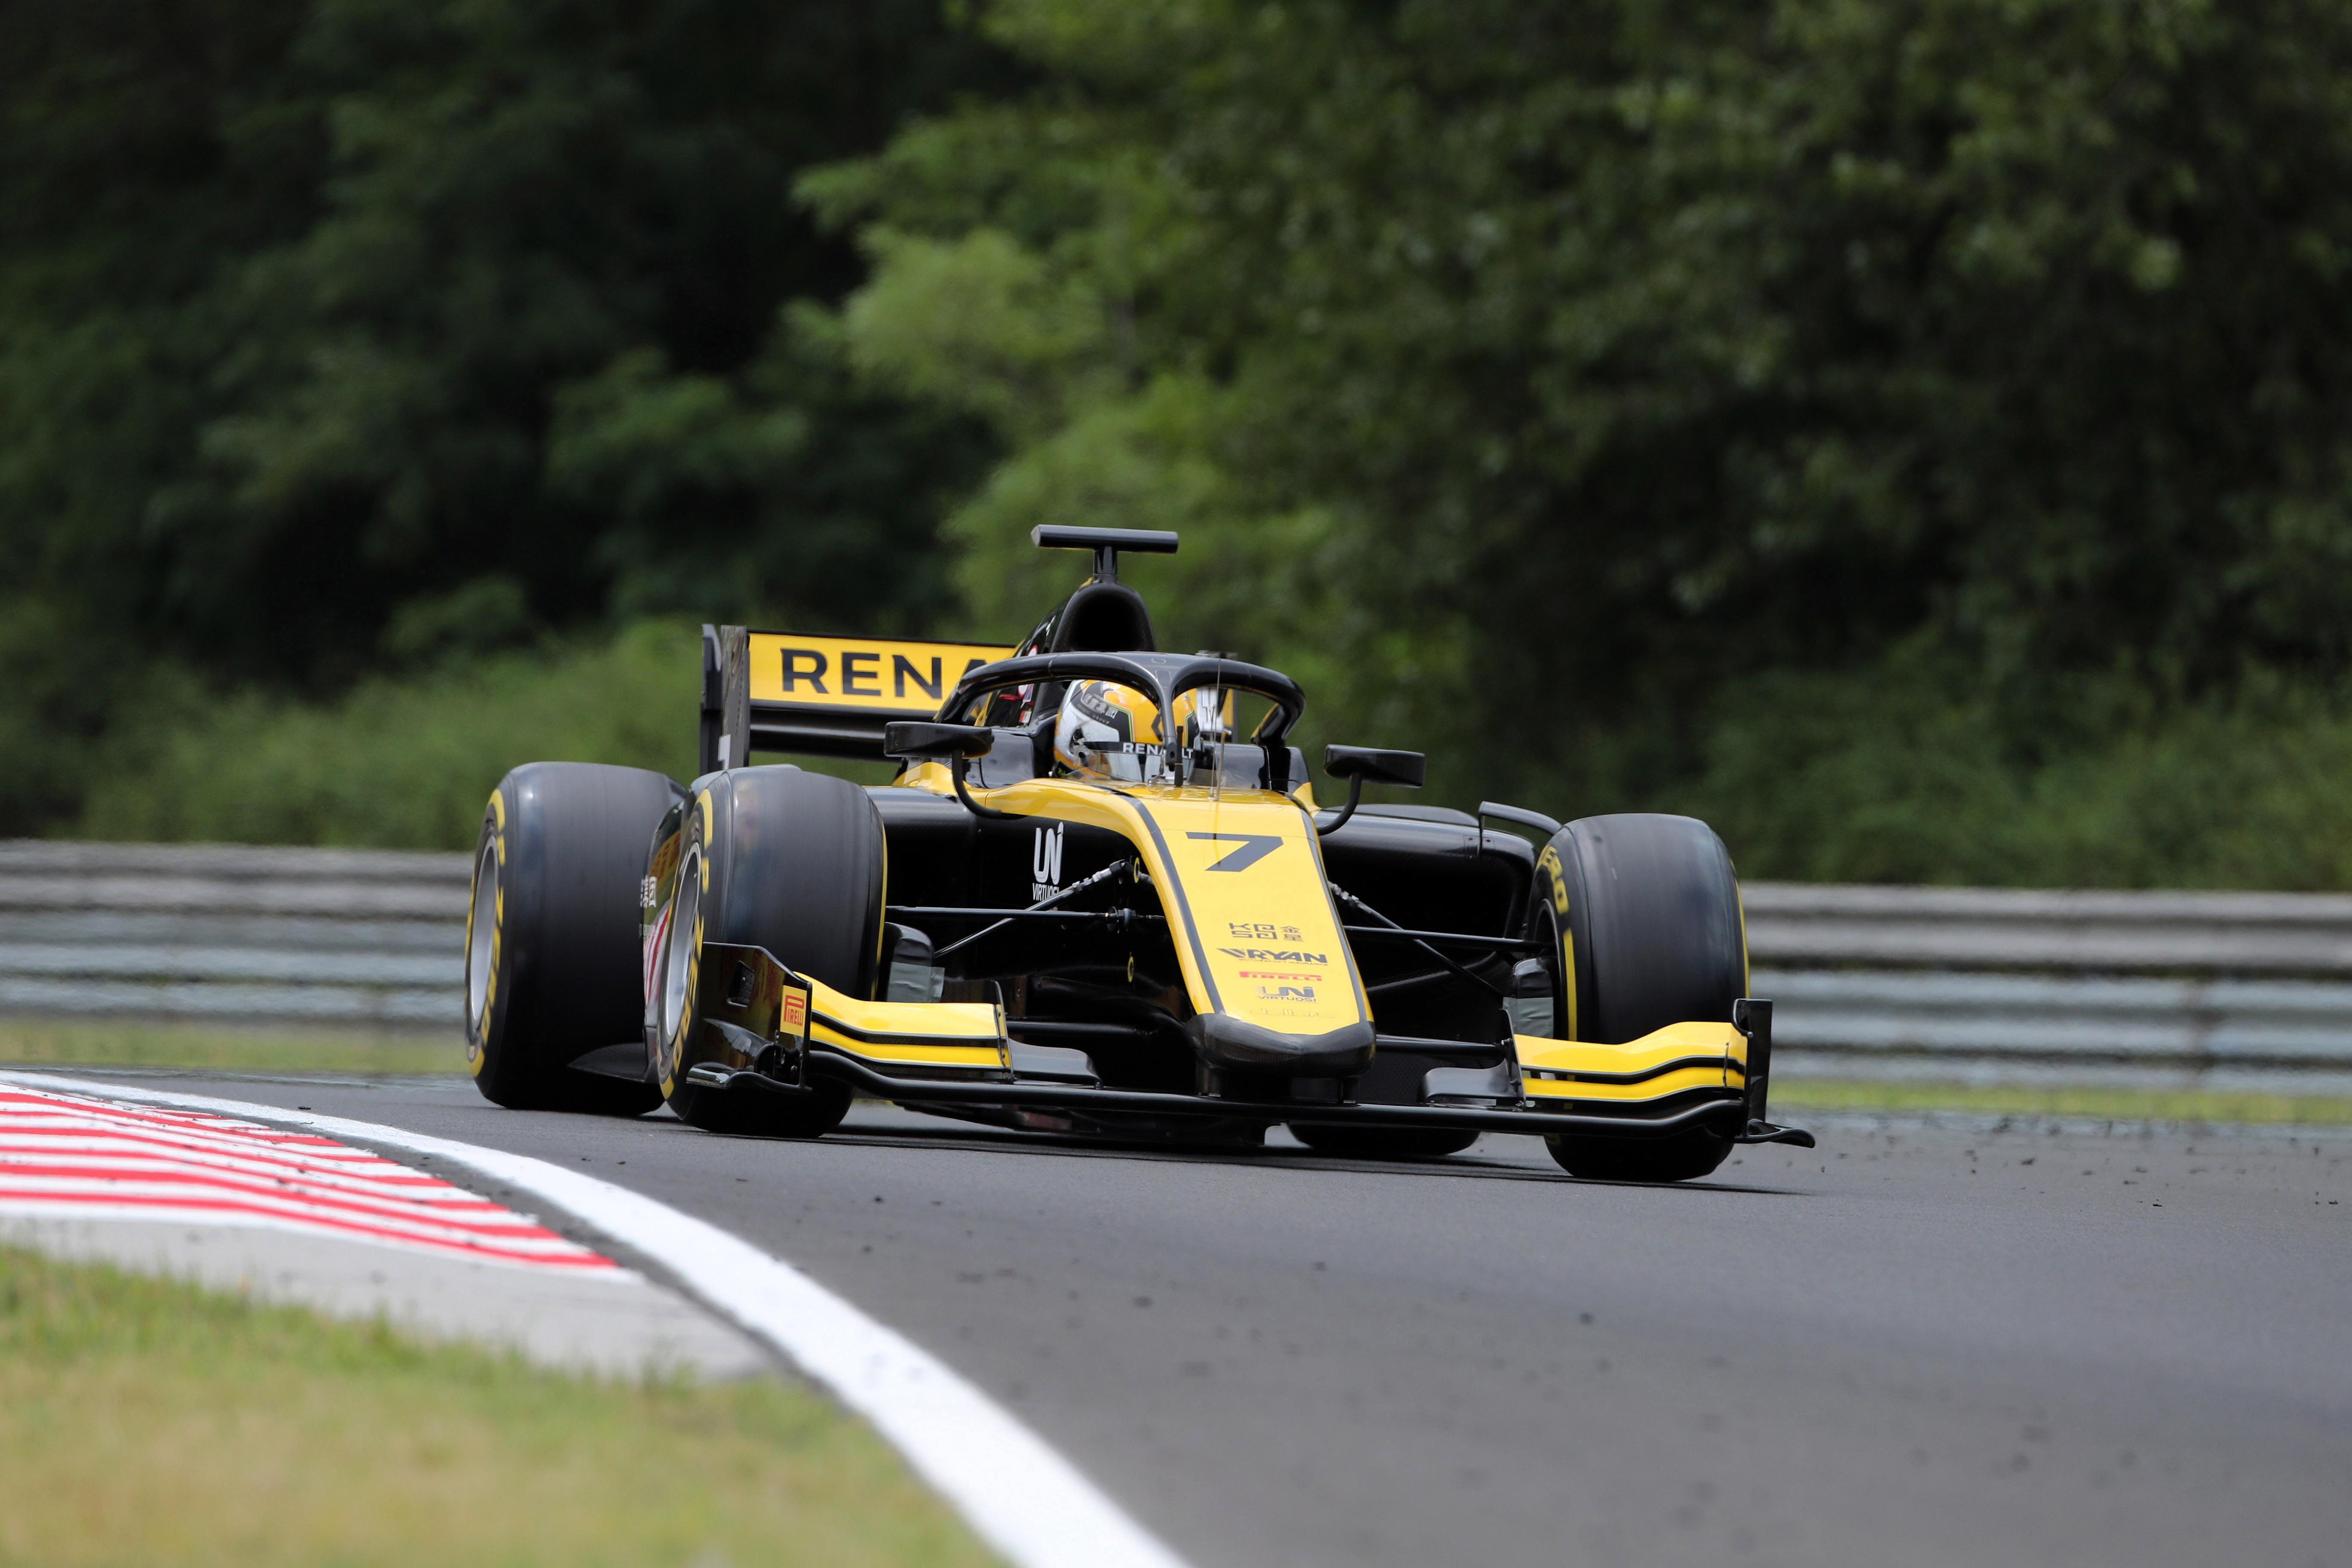 Motor Racing Fia Formula 2 Championship Friday Budapest, Hungary